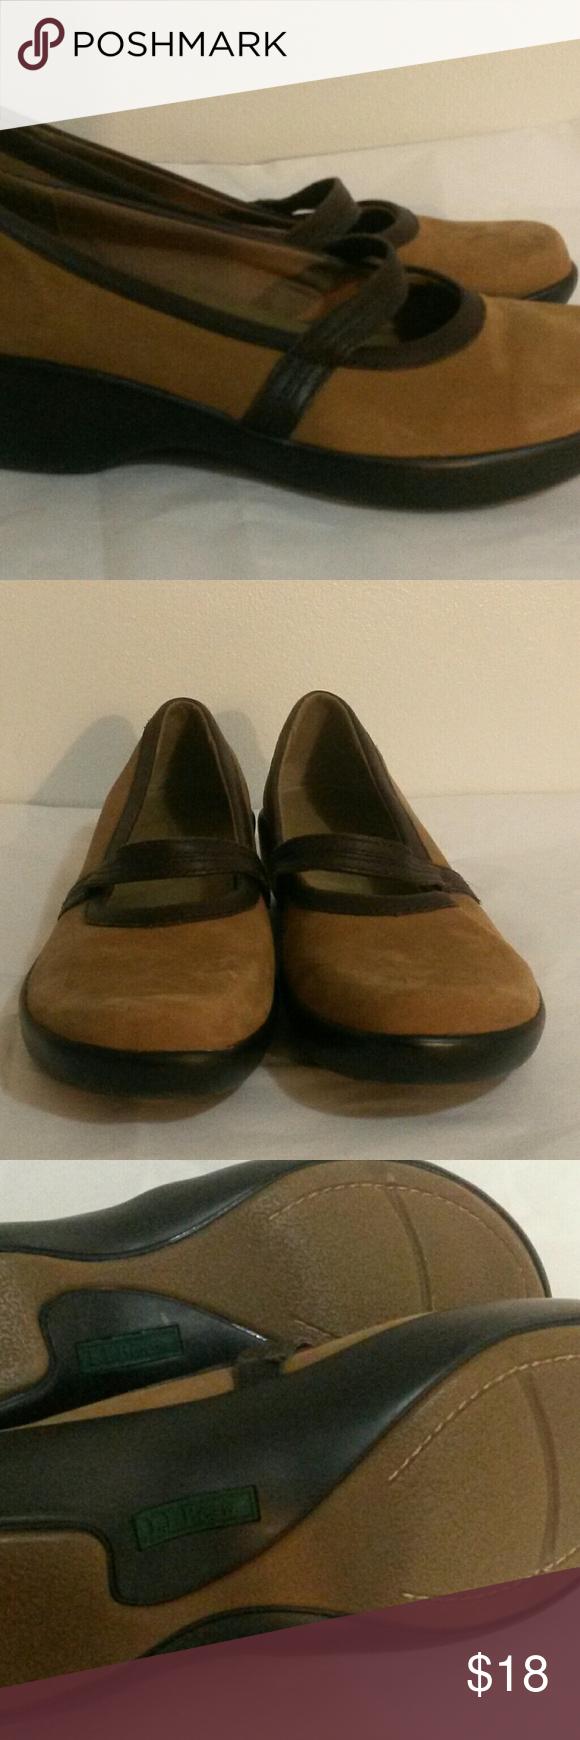 L.L.Bean Flats In excellent condition L.L. Bean Shoes Flats & Loafers